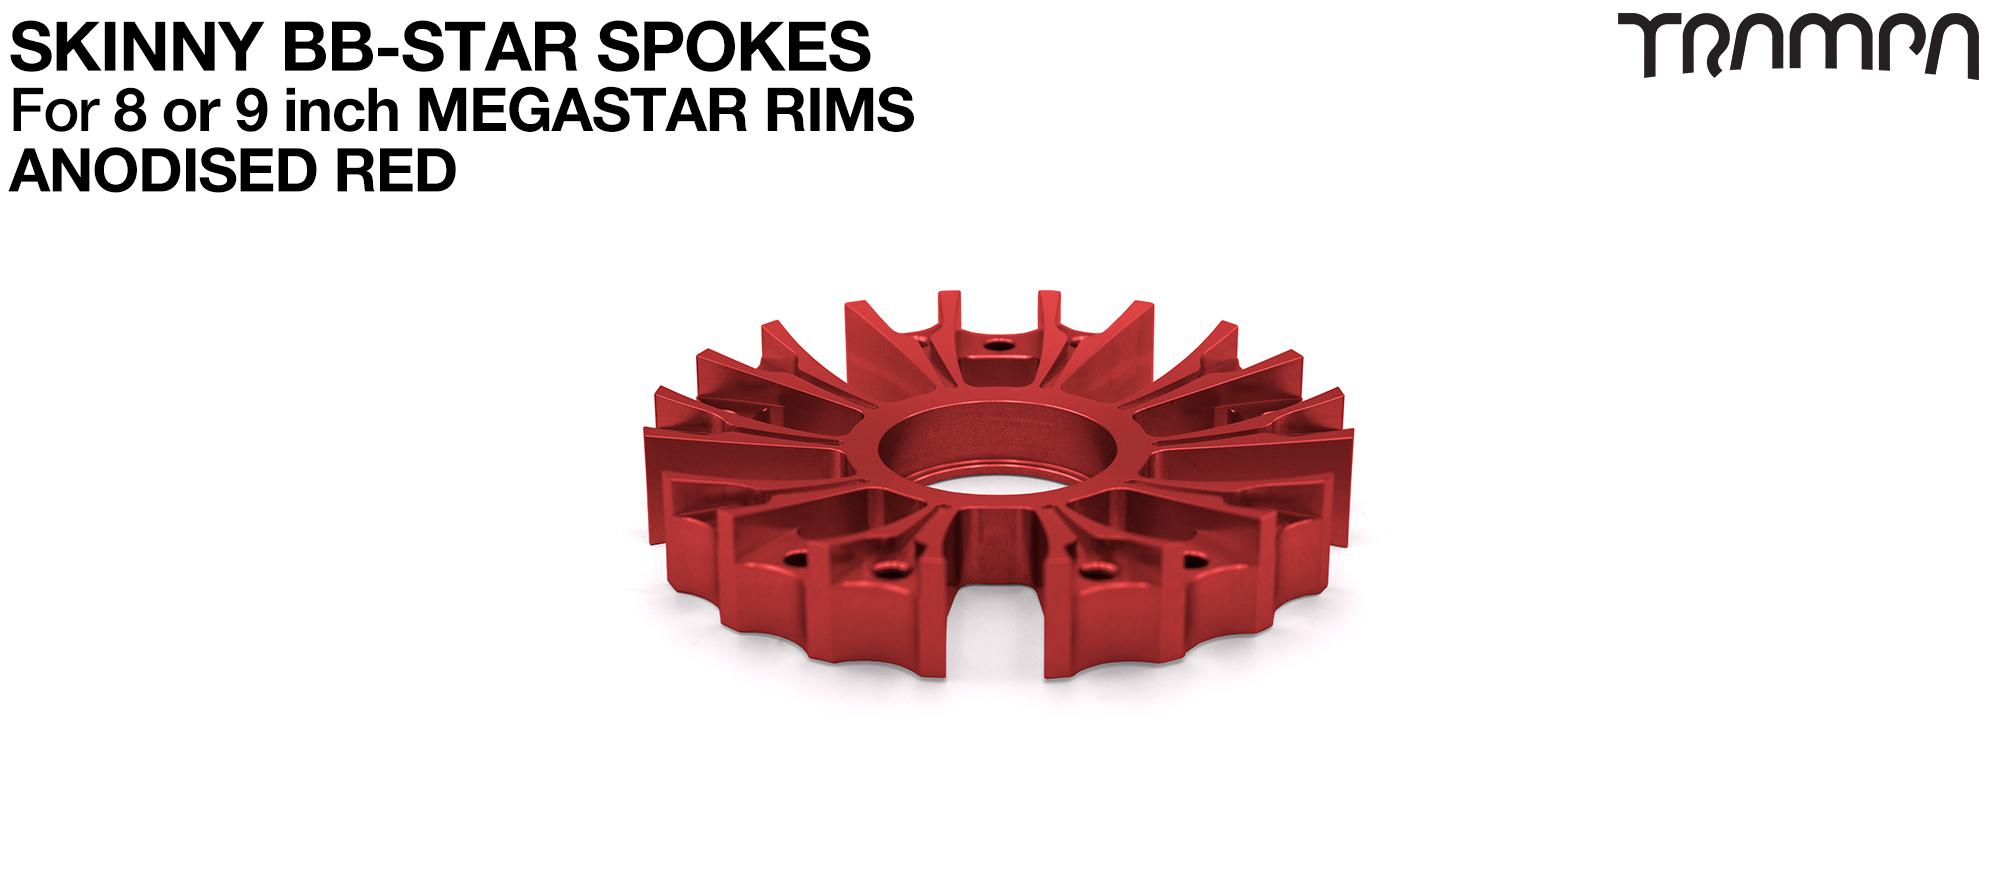 BB Star Spoke for 8 Inch DEEP-DISH MEGASTAR Rim - CNC Precision milled - RED